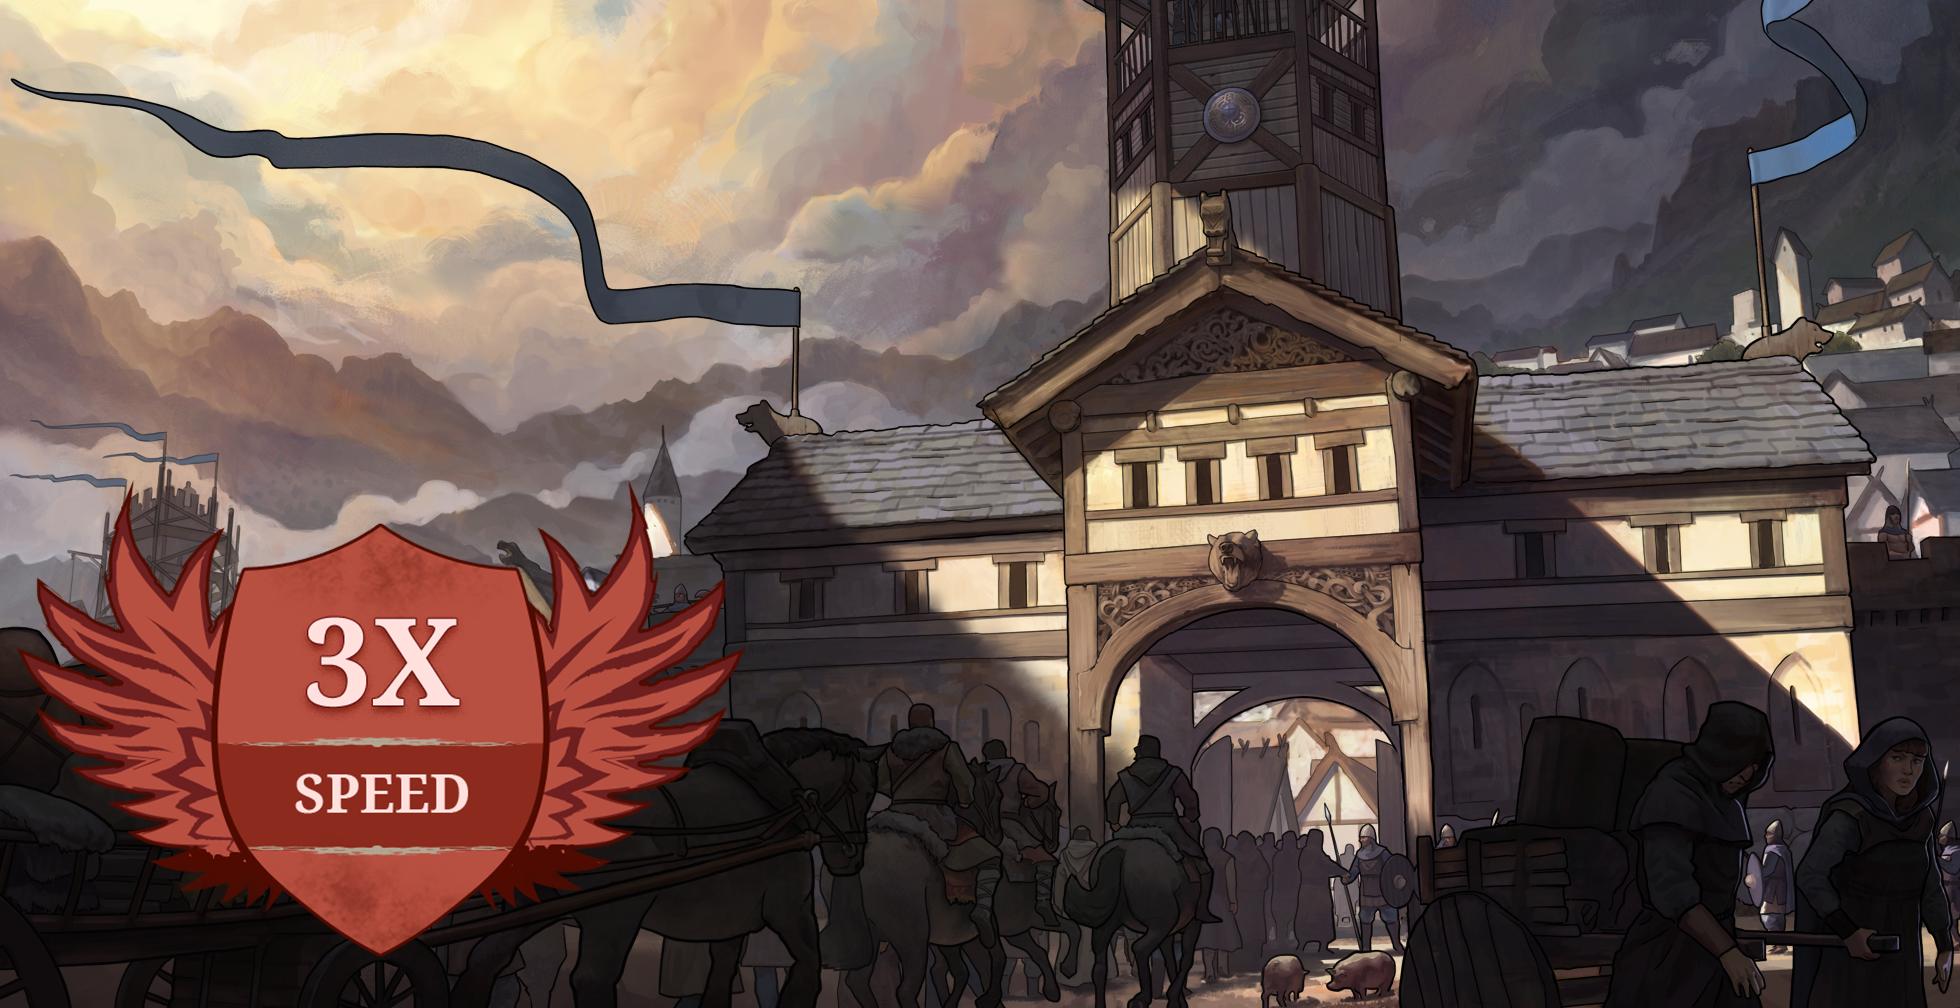 Travian: Tides of Conquest – x3 Speed – Πληροφορίες Κόσμου Παινχνιδιού